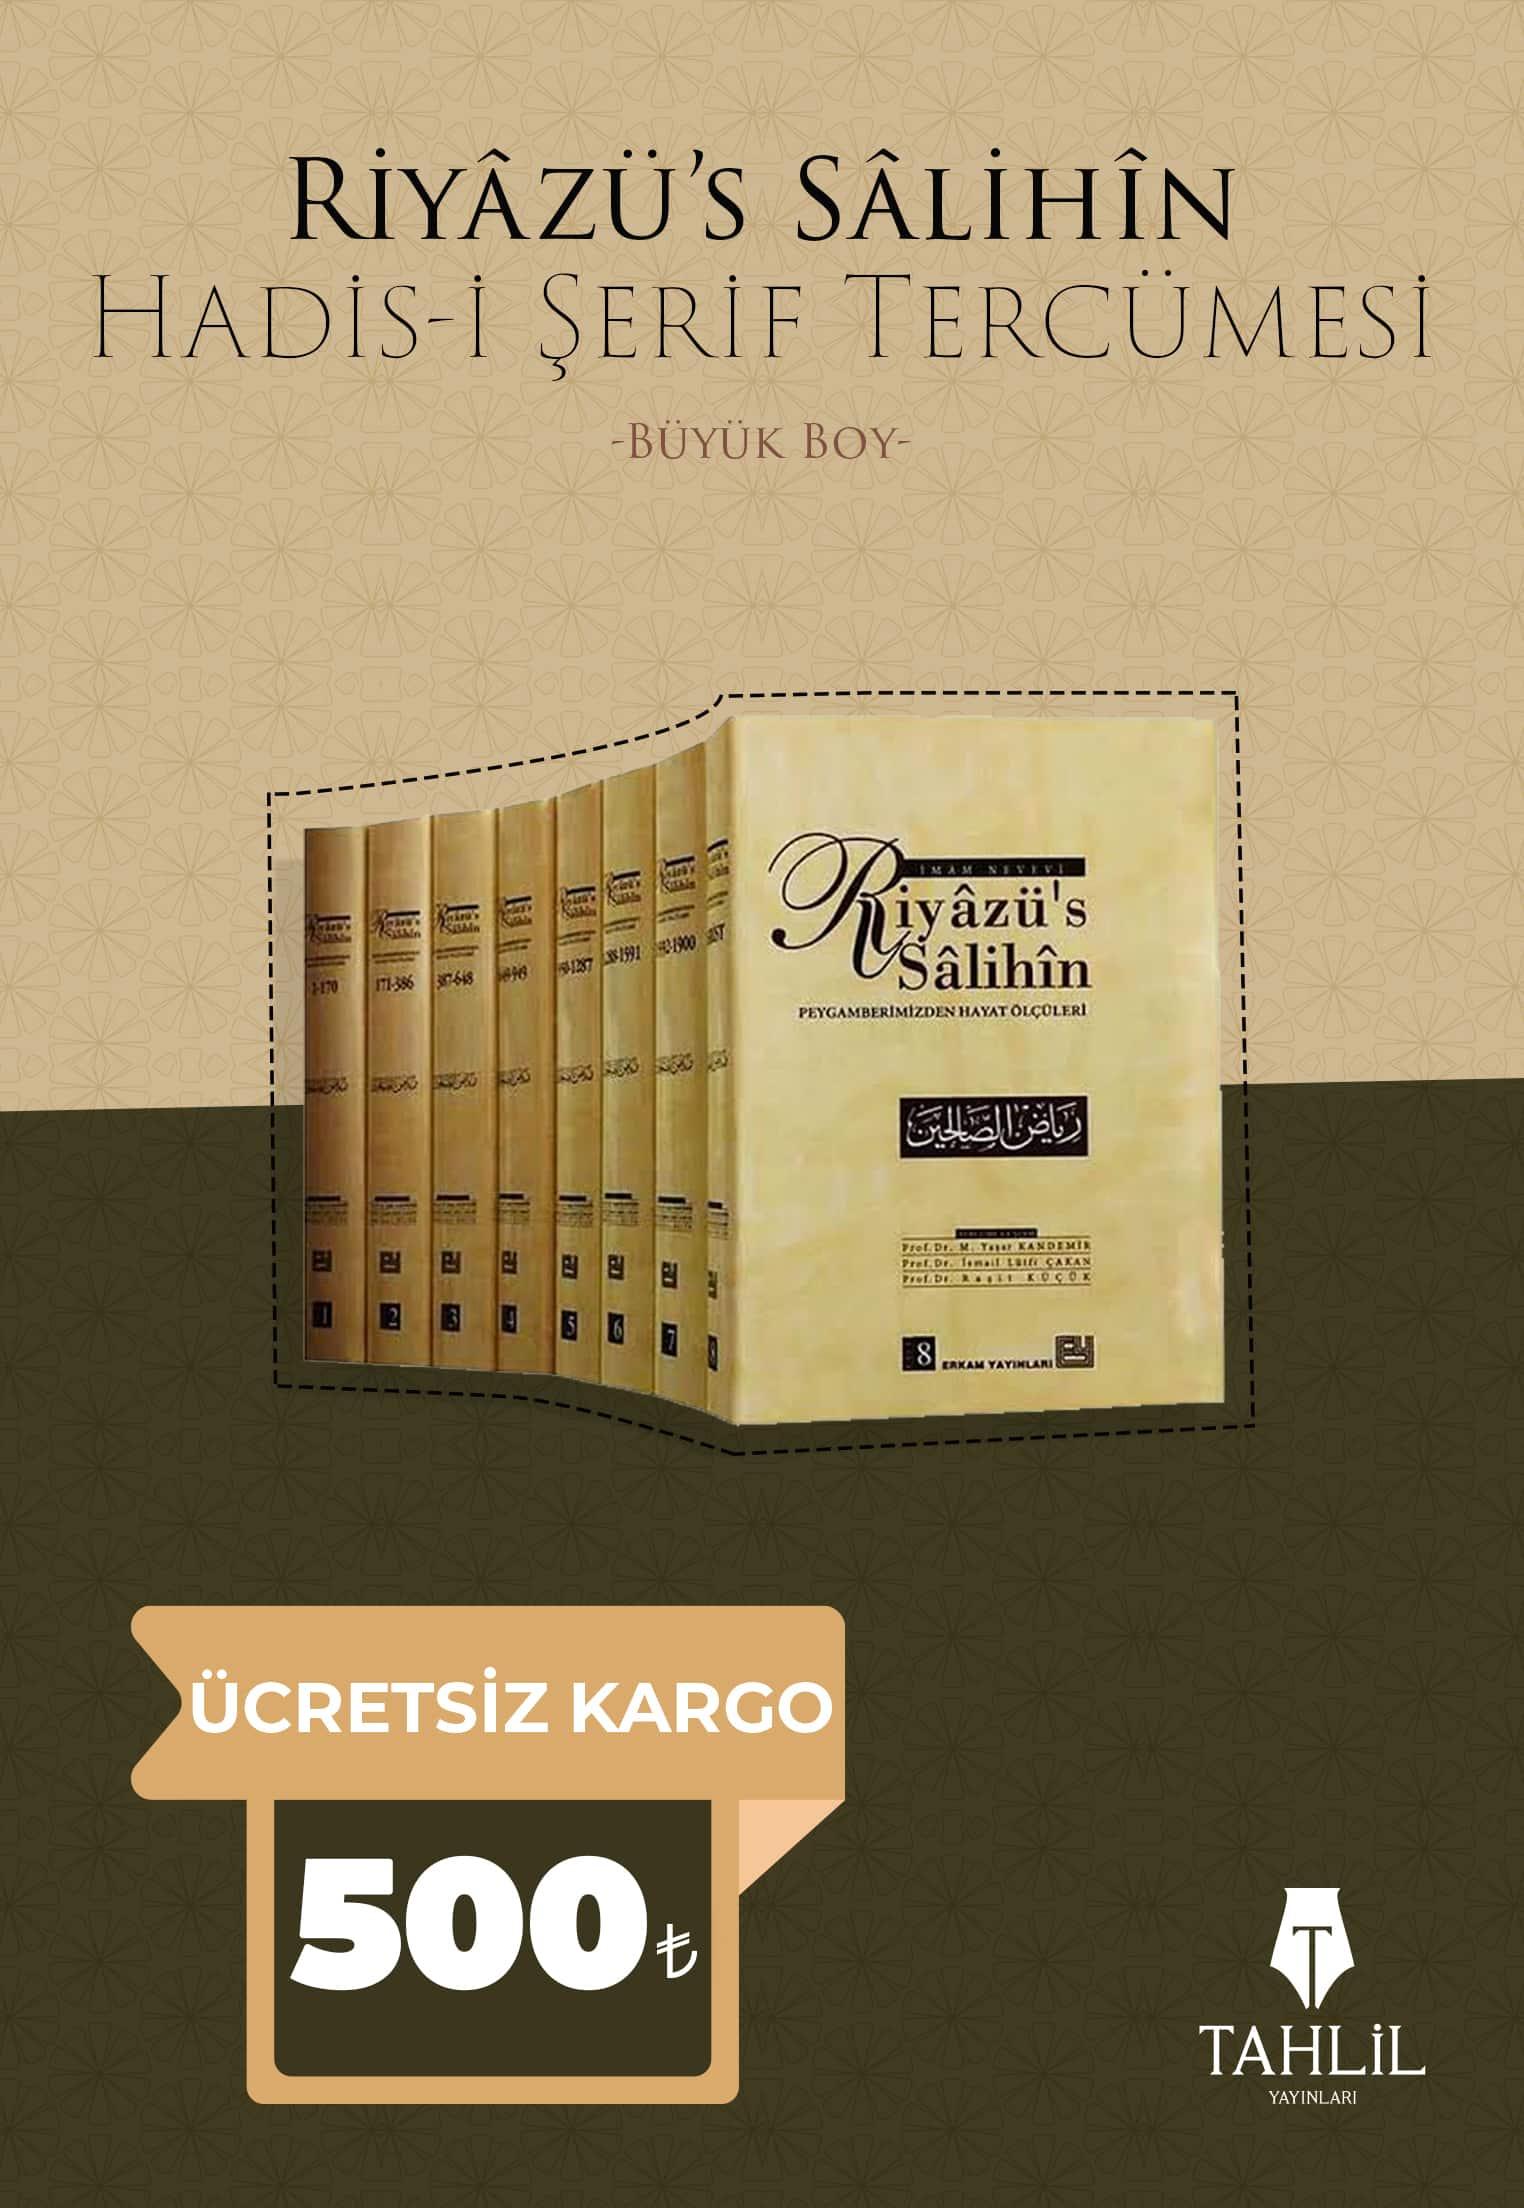 Riyâzü's Sâlihîn Hadis-i Şerif Tercümesi (8 Cilt)